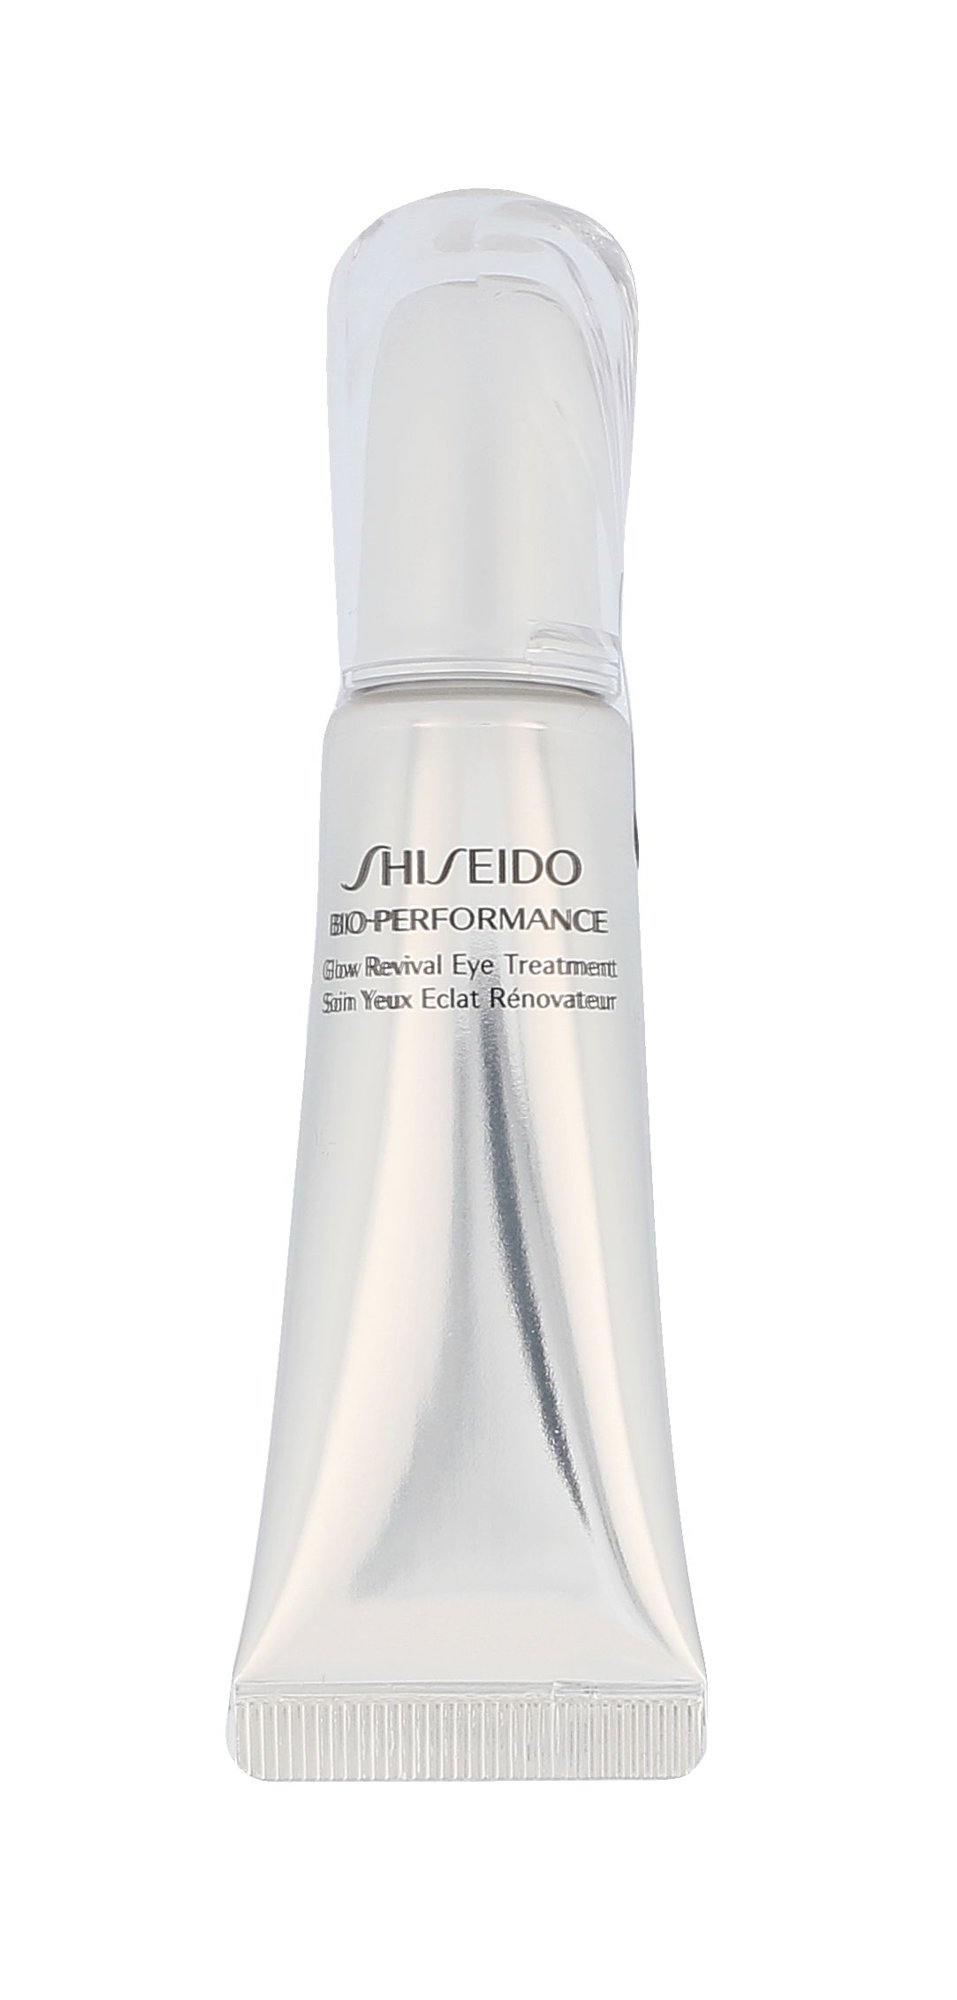 Shiseido Bio-Performance Eye Cream 15ml